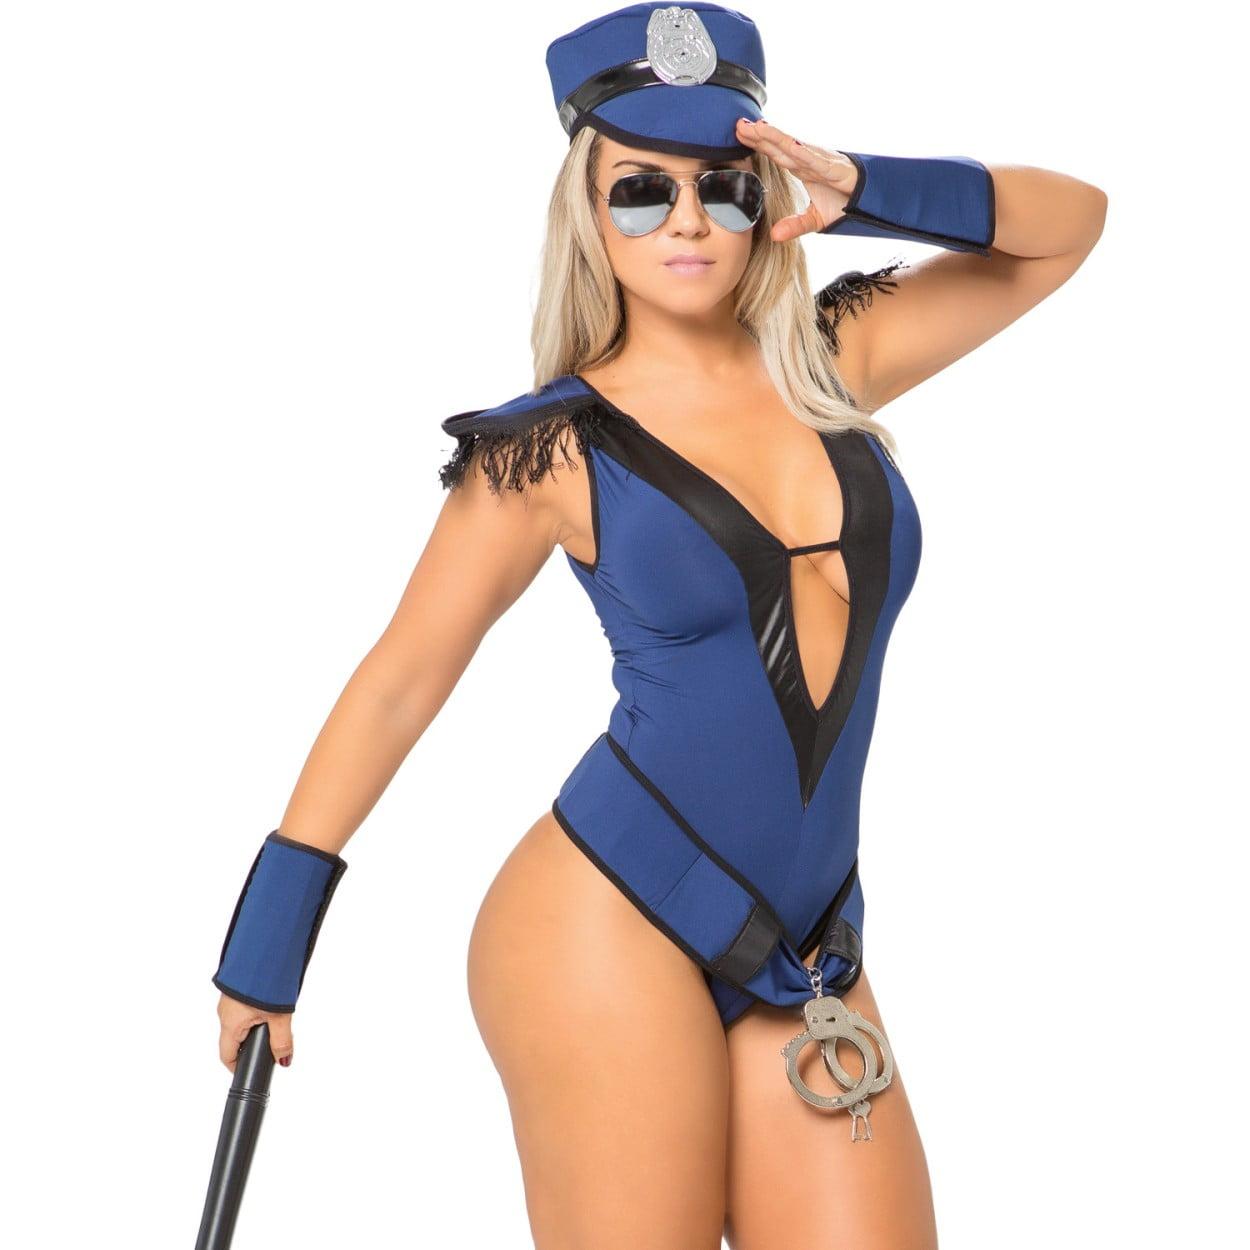 Fantasia Policial Anne